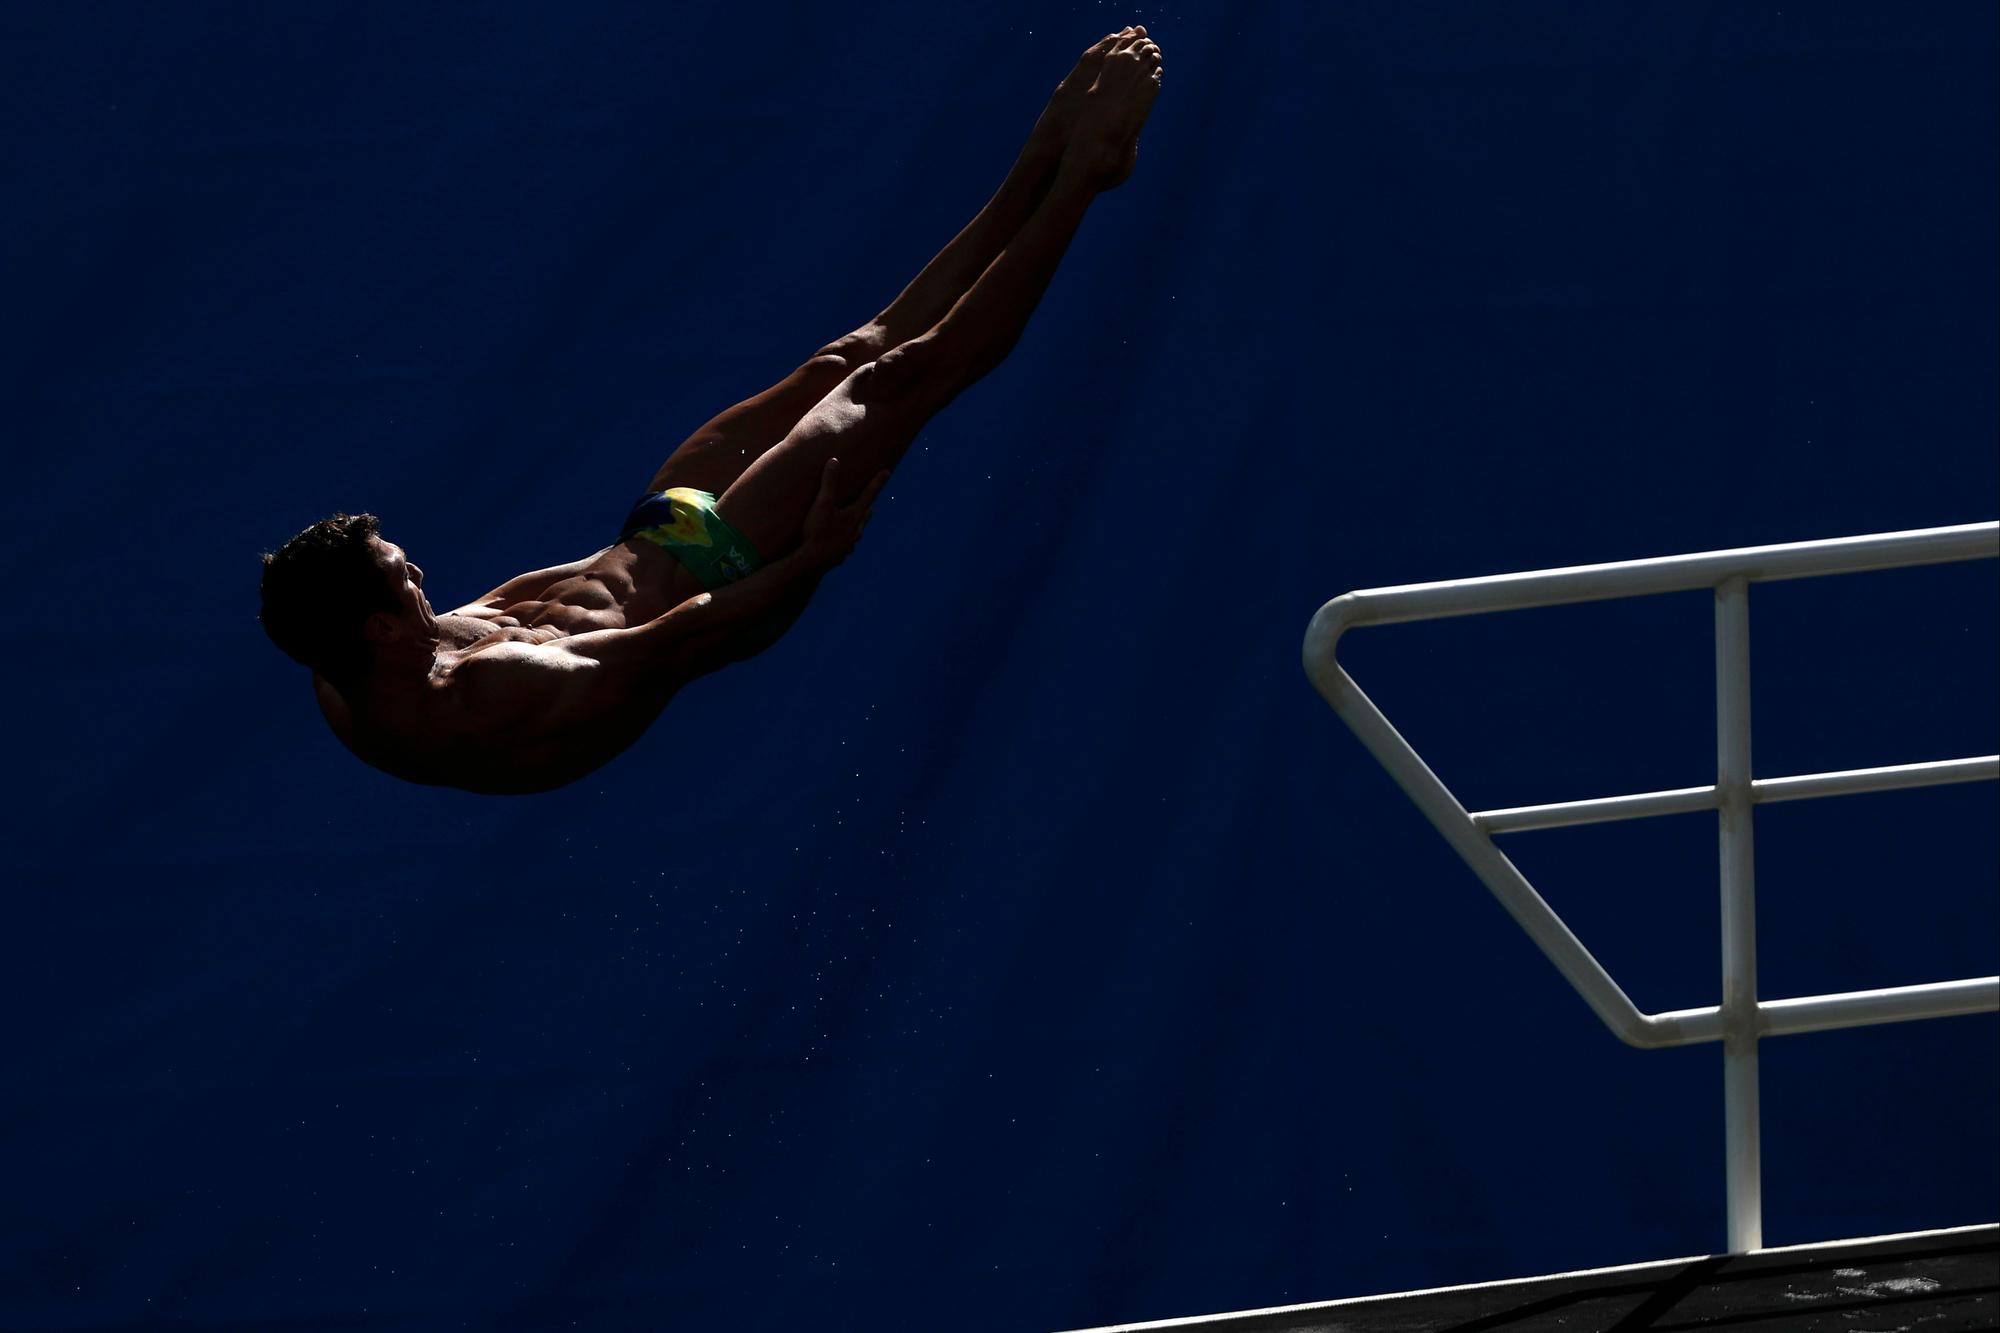 Brazil's Hugo Parisi takes practice at the Maria Lenk Aquatic Center at 2016 Rio Summer Olympics in Rio de Janeiro, Brazil, on August 13, 2016.